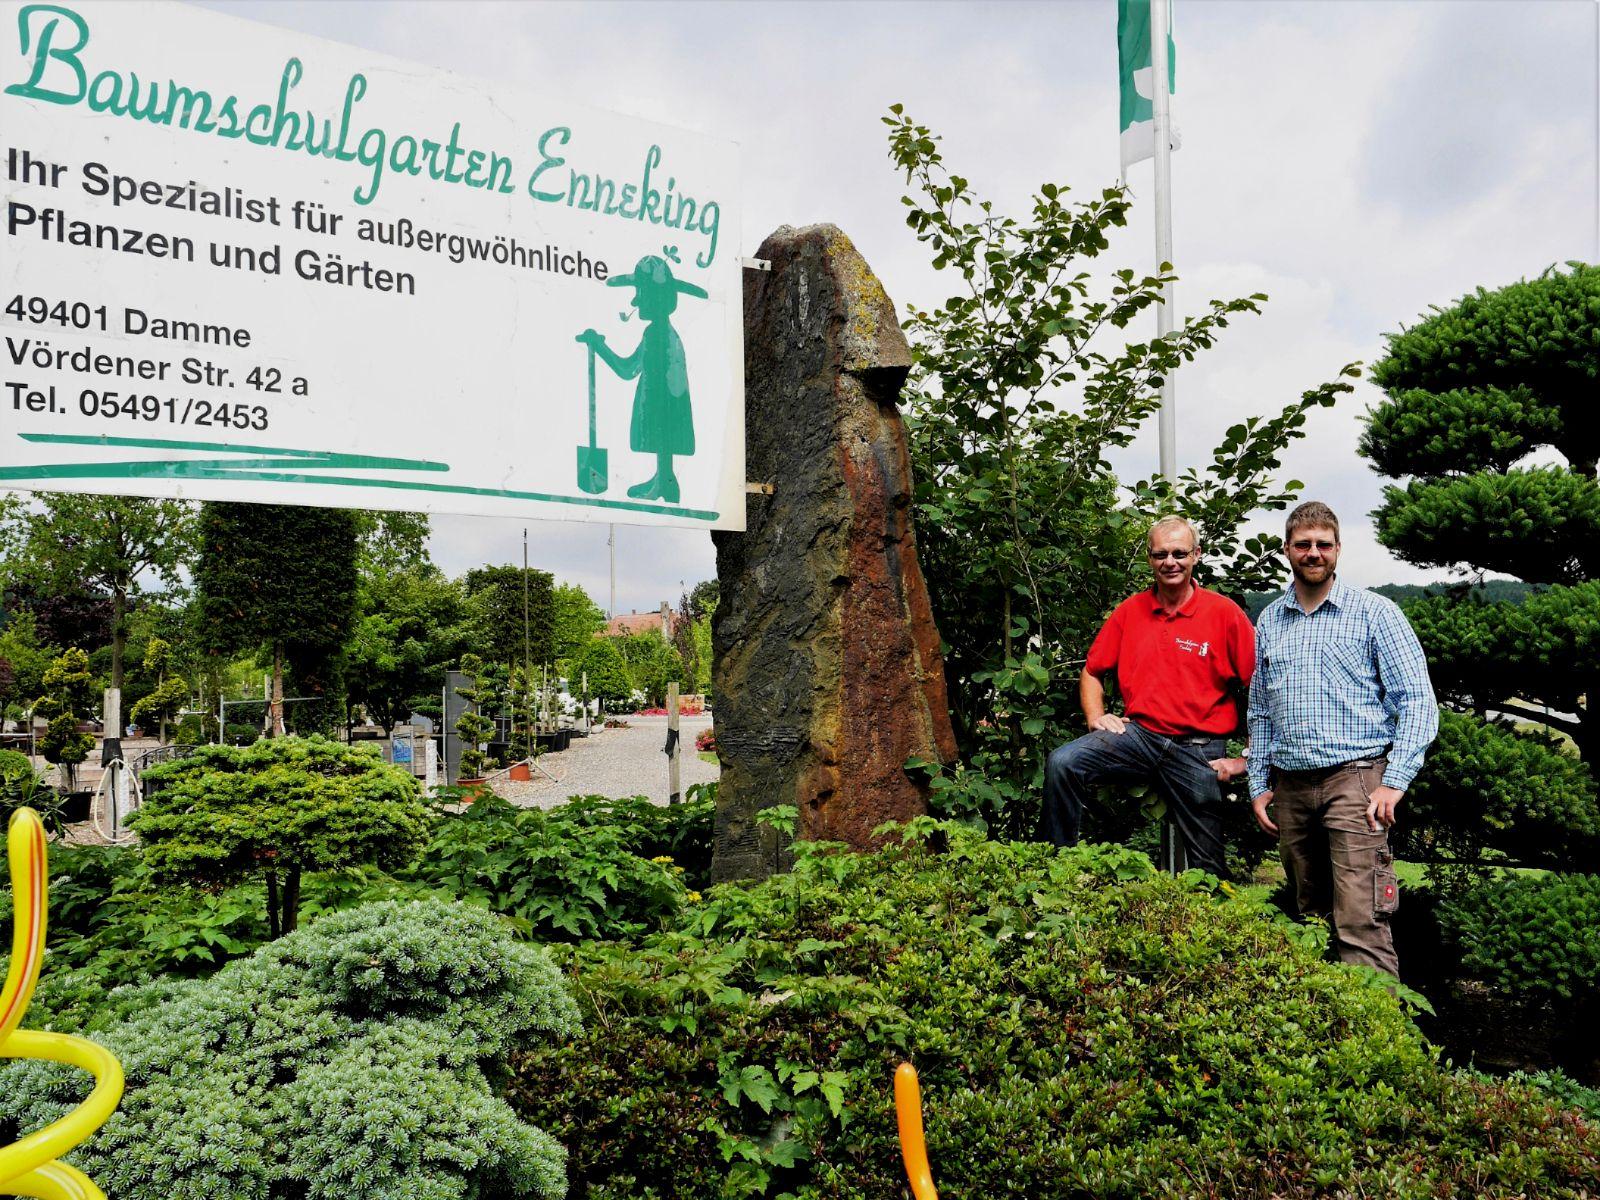 Baumschulgarten Enneking